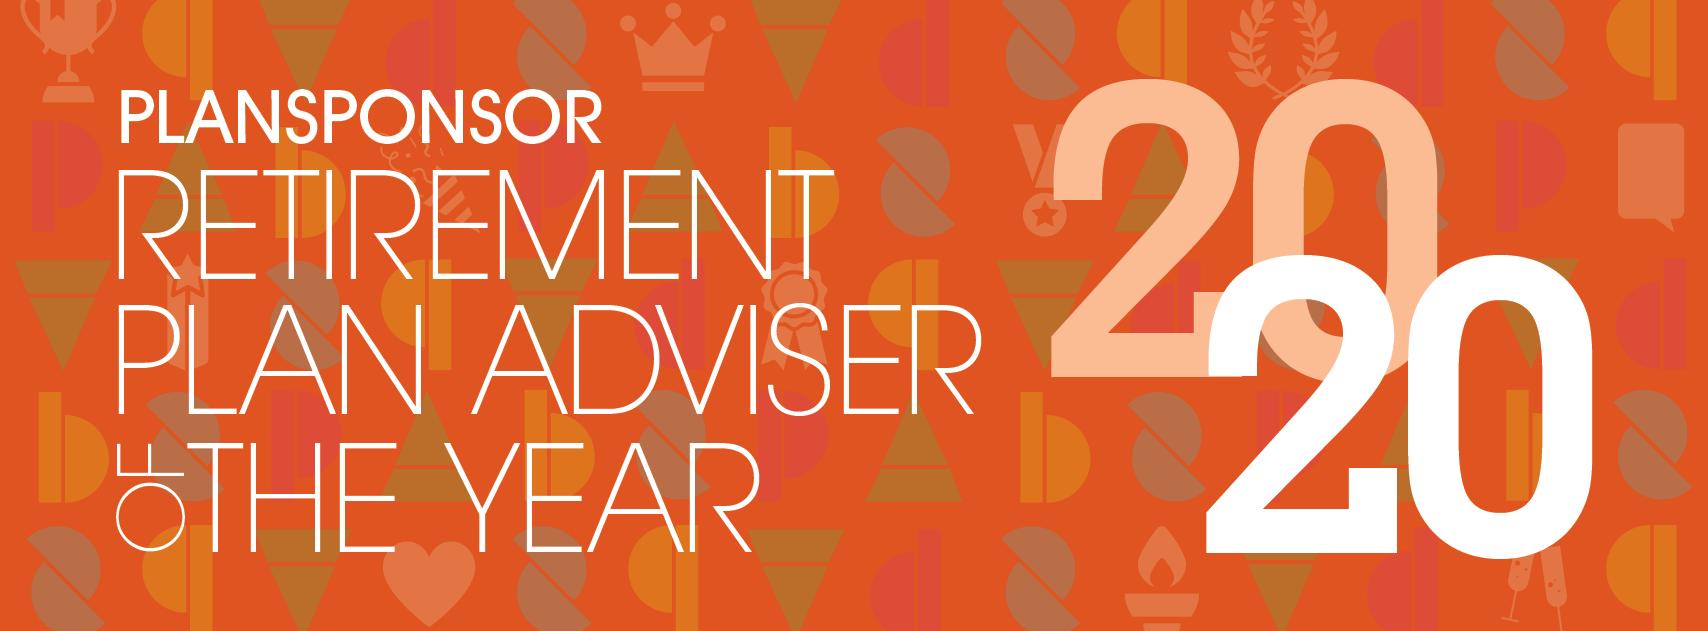 Plan Adviser of the Year